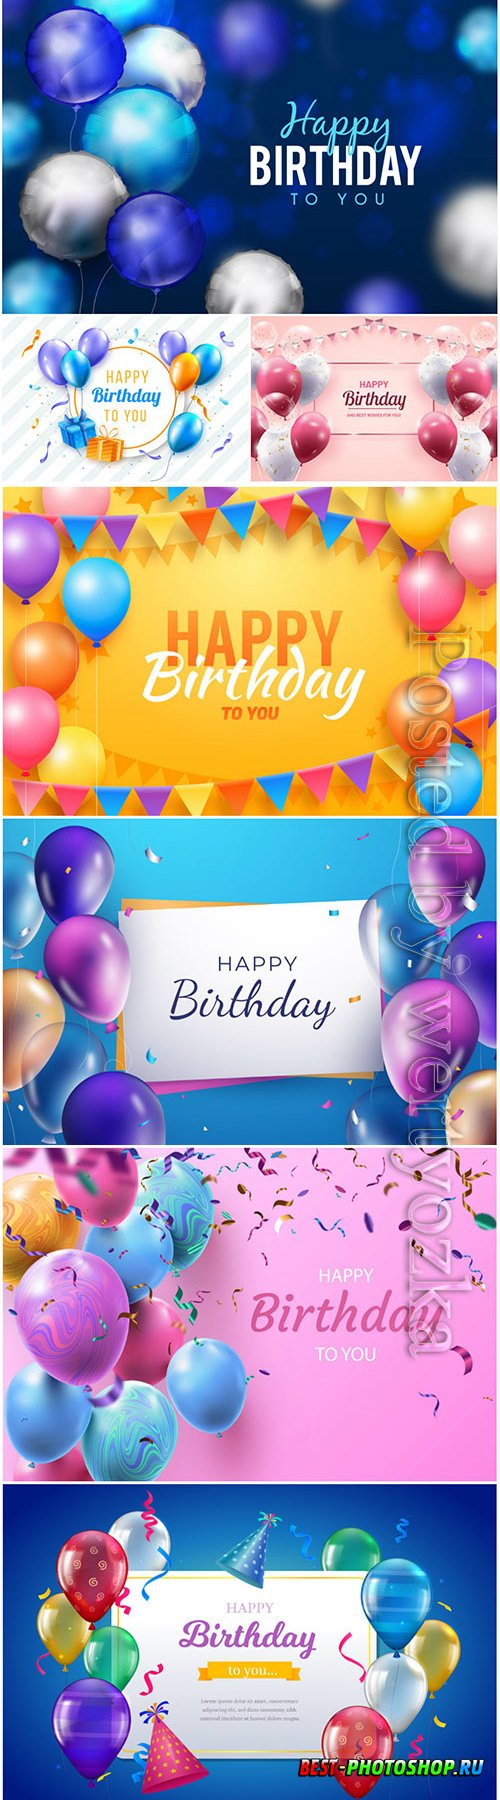 Happy birthday vector backgrounds